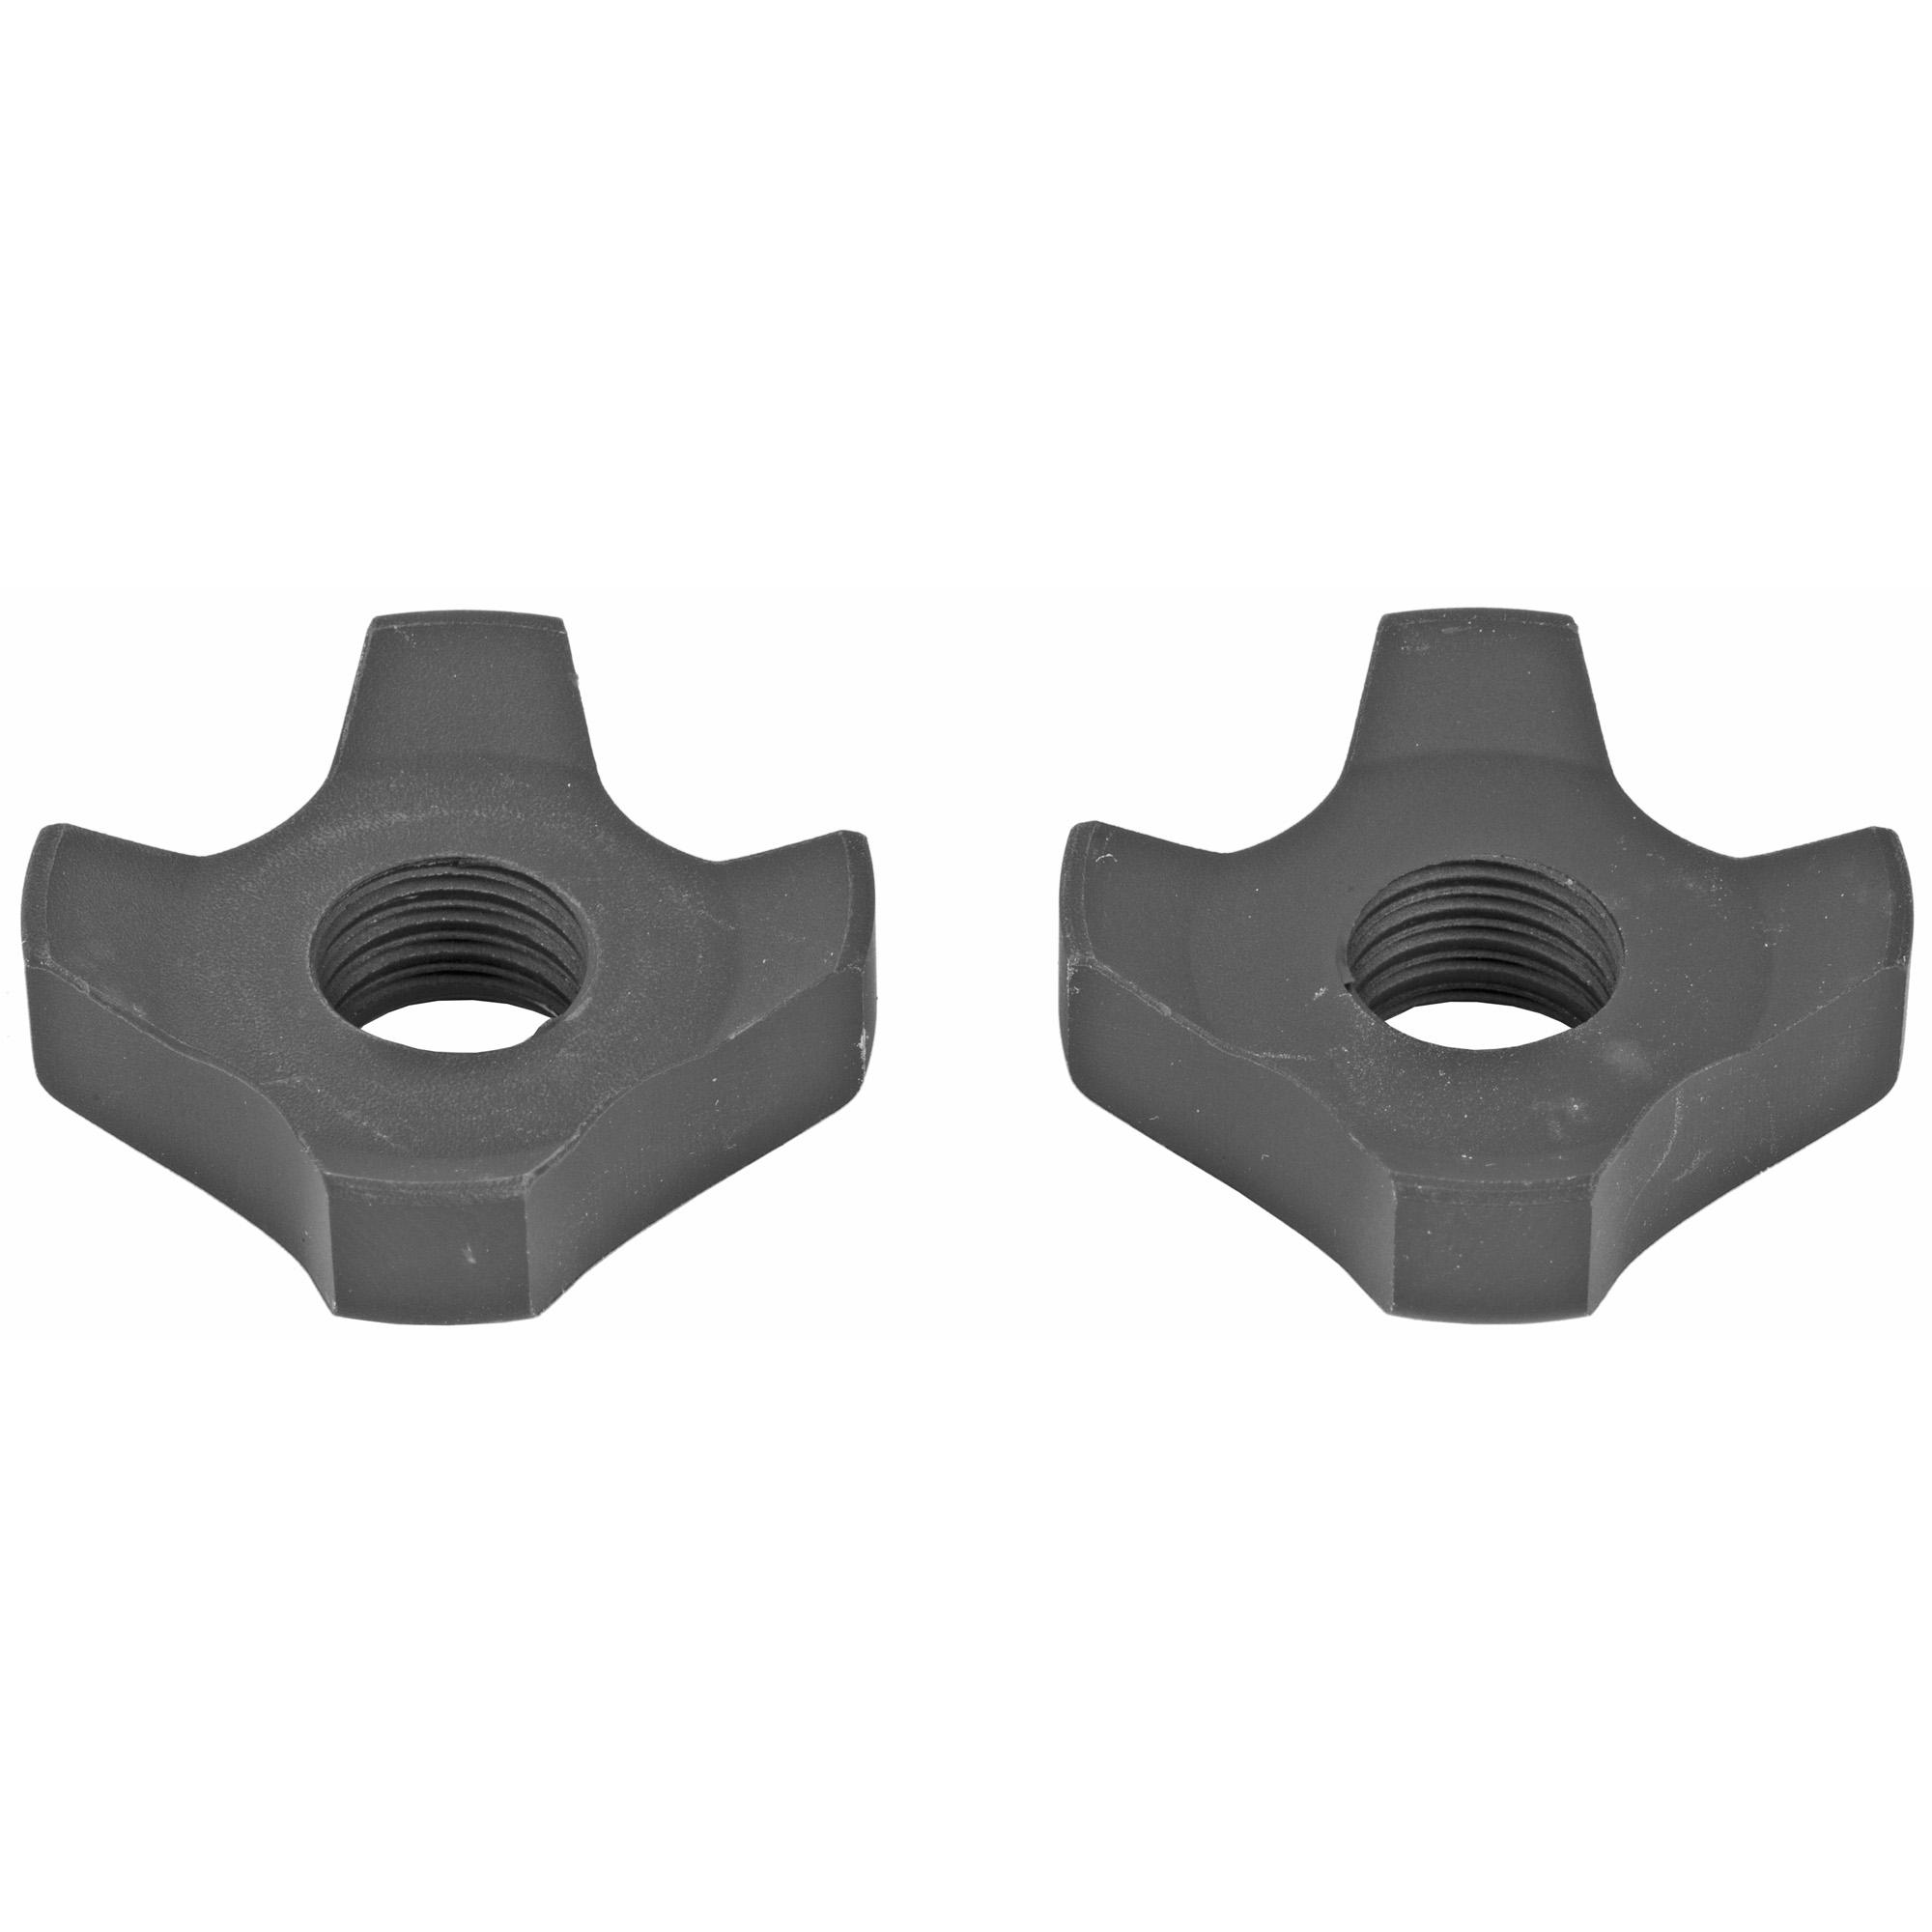 Accu-tac Spike Claws Set